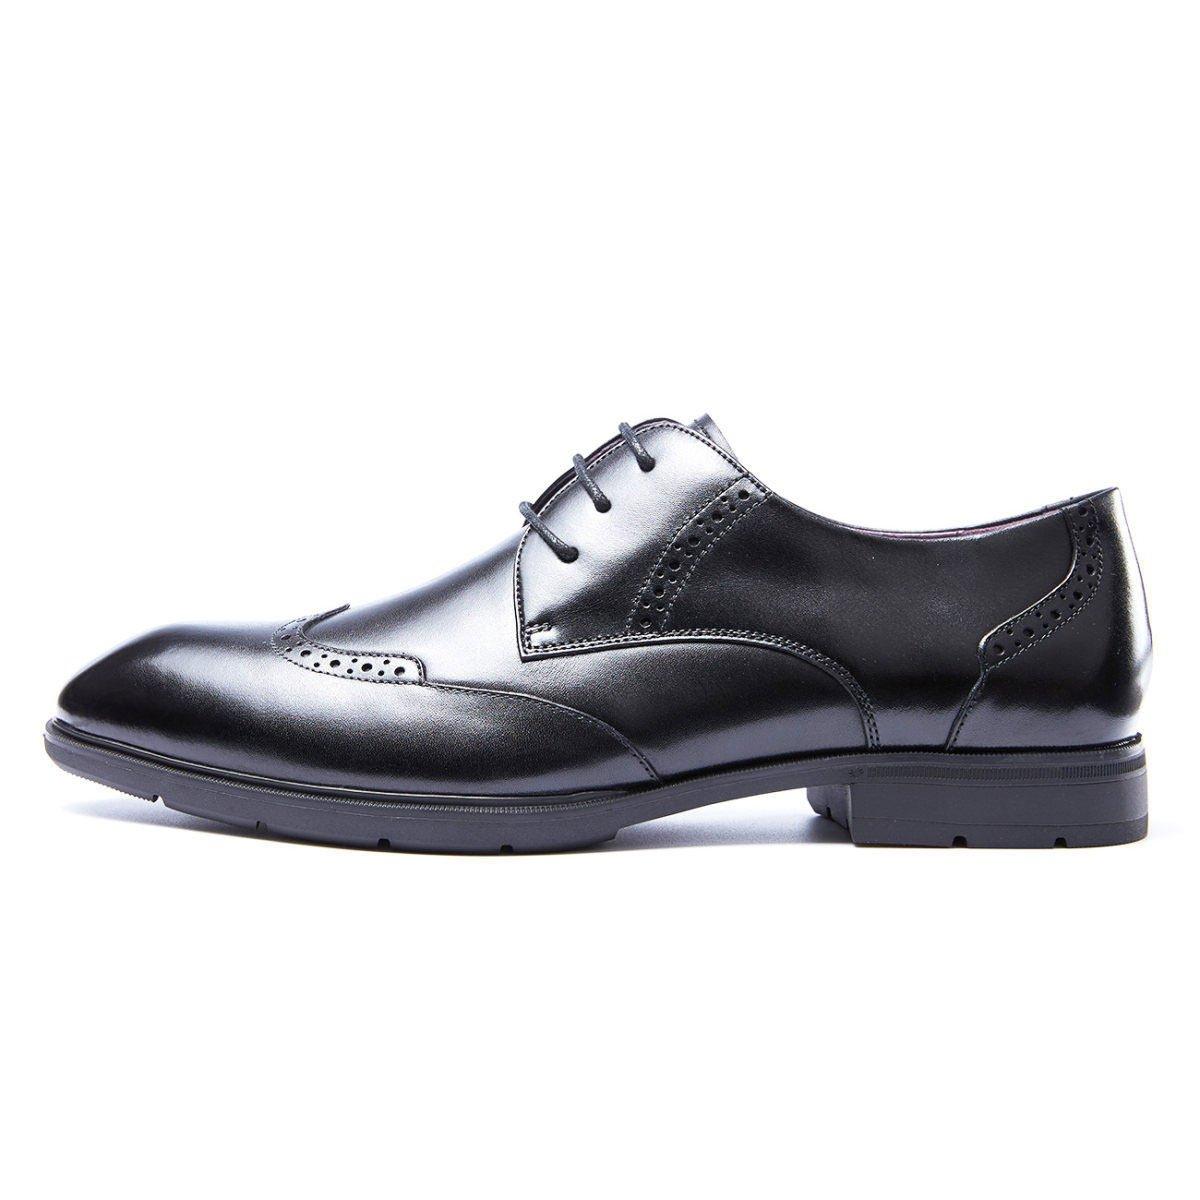 LEDLFIE Herrenschuhe Business Formal Wear Lederschuhe Schnürsenkel Tipps schwarz Niedrig Schuhes Single Schuhes schwarz Tipps b83348